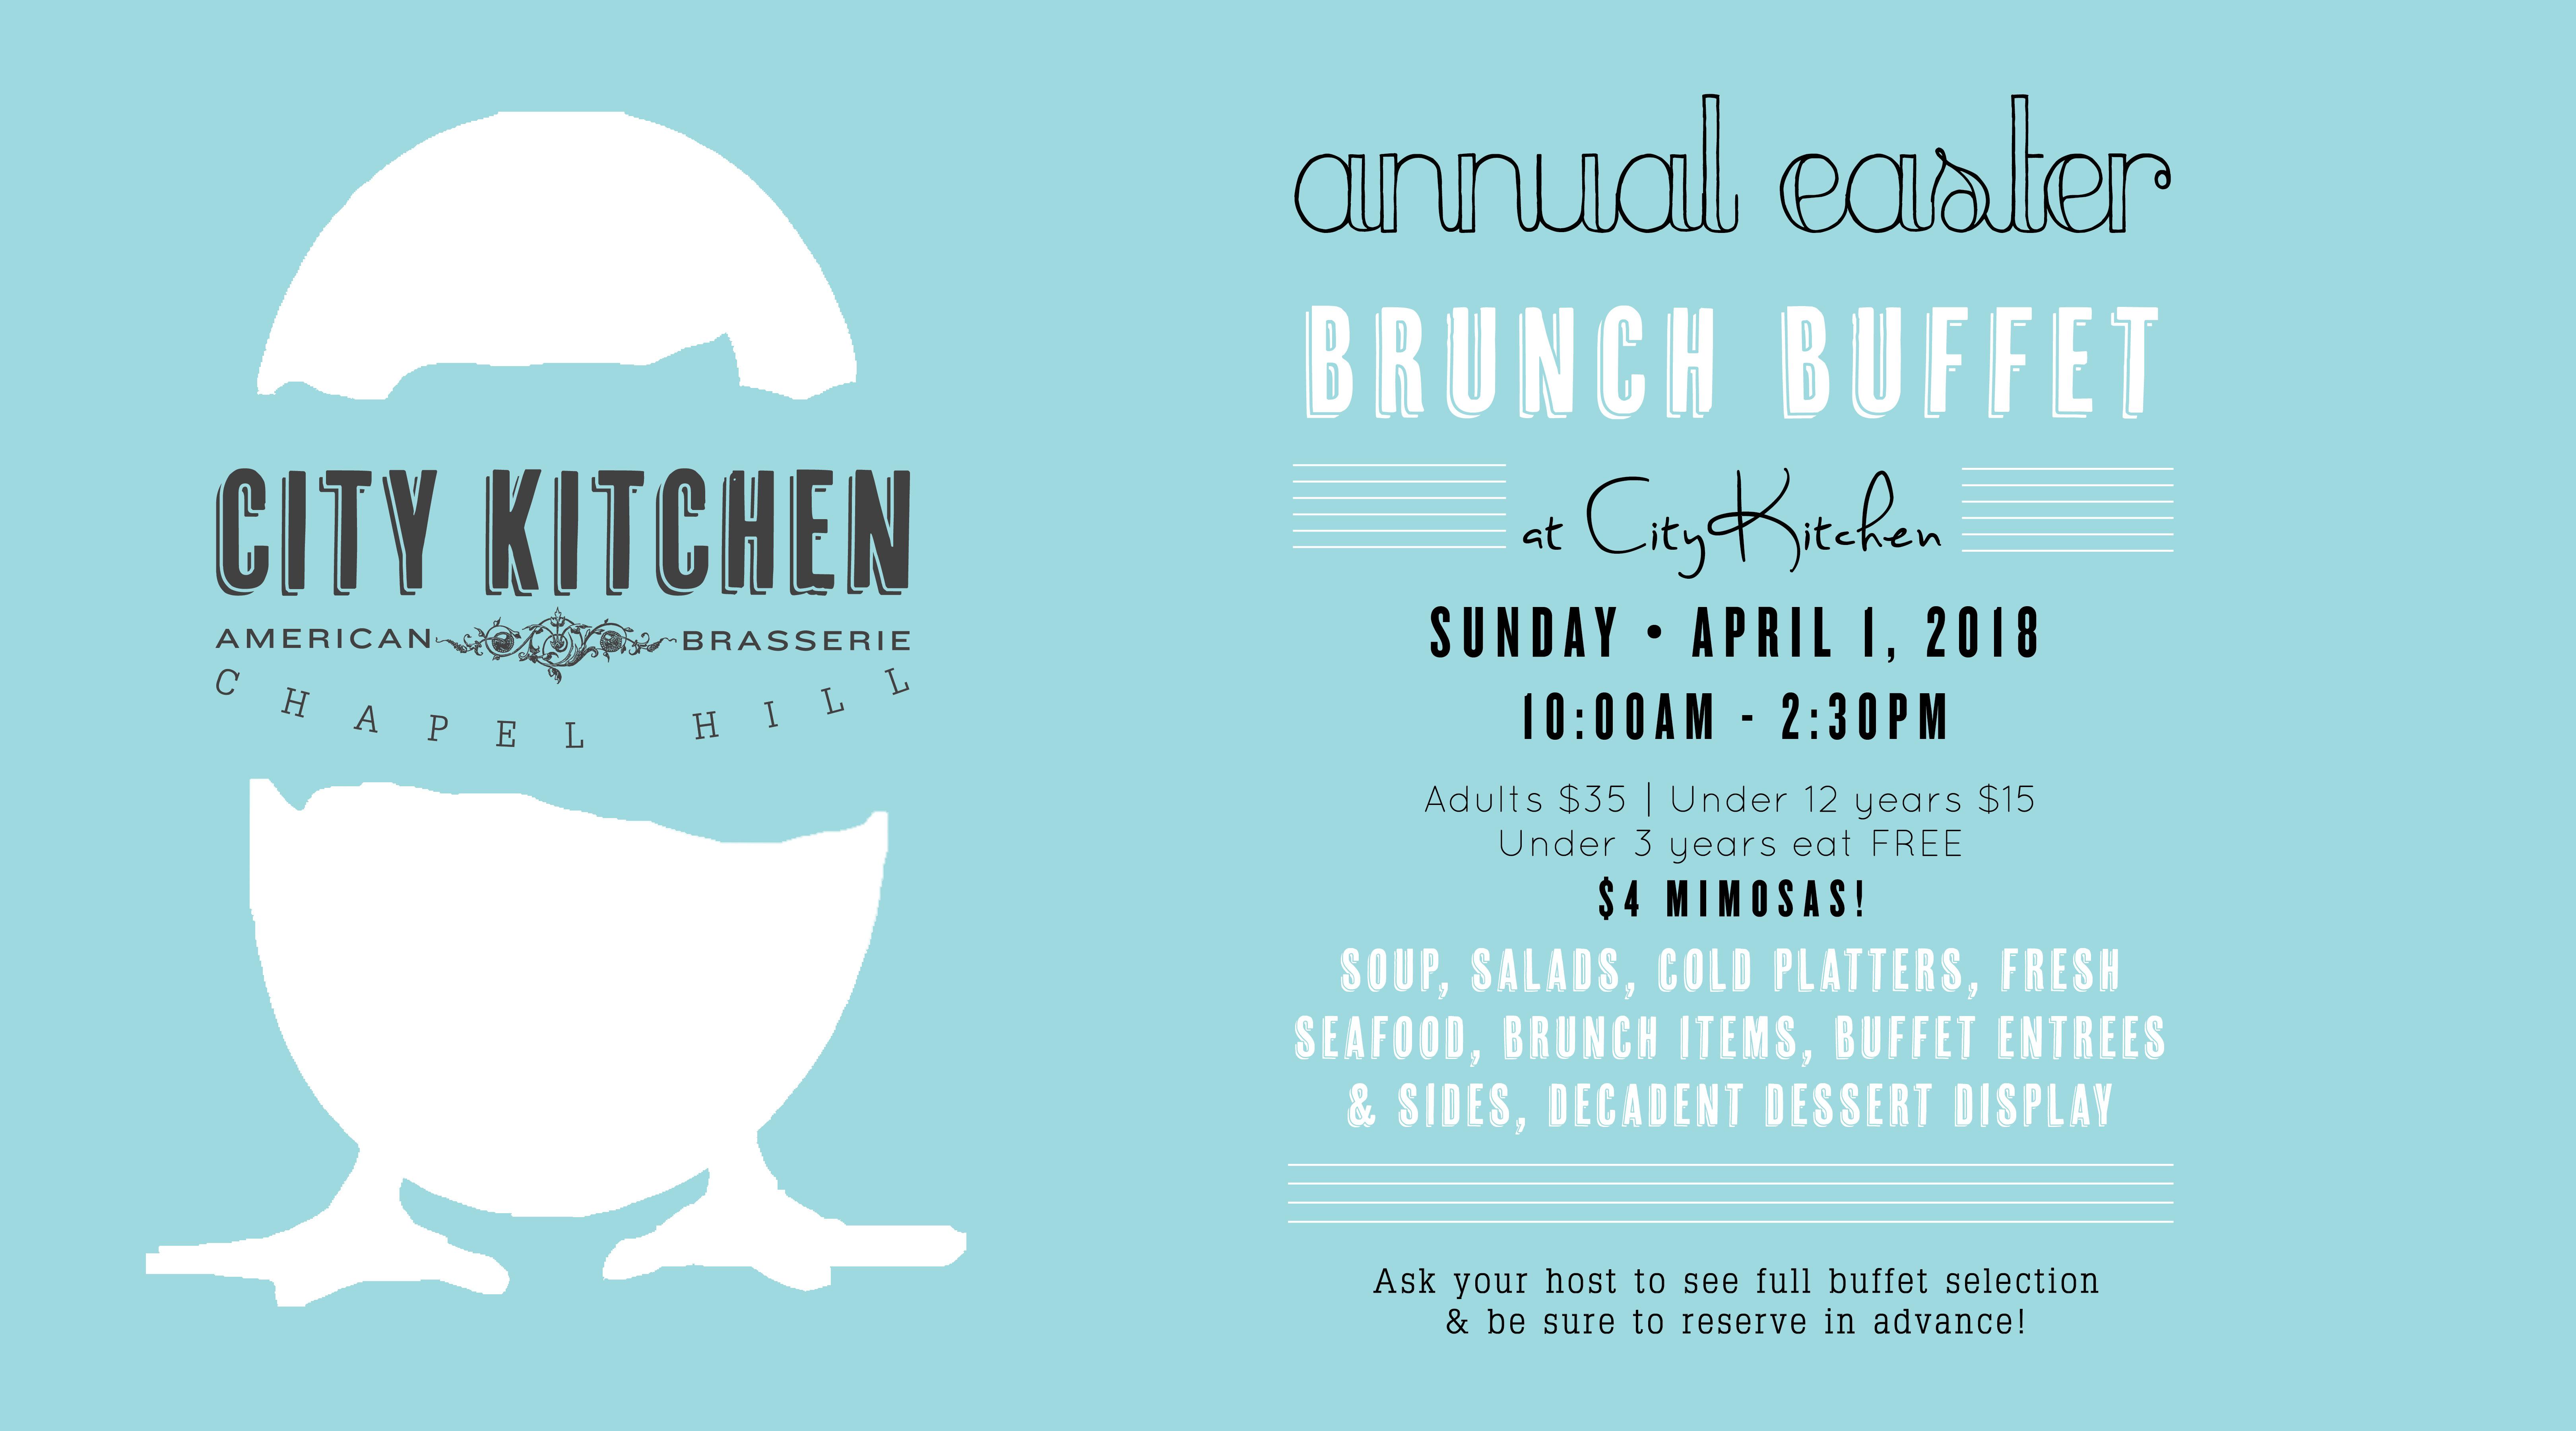 Magnificent Annual Easter Brunch Buffet City Kitchen Interior Design Ideas Lukepblogthenellocom